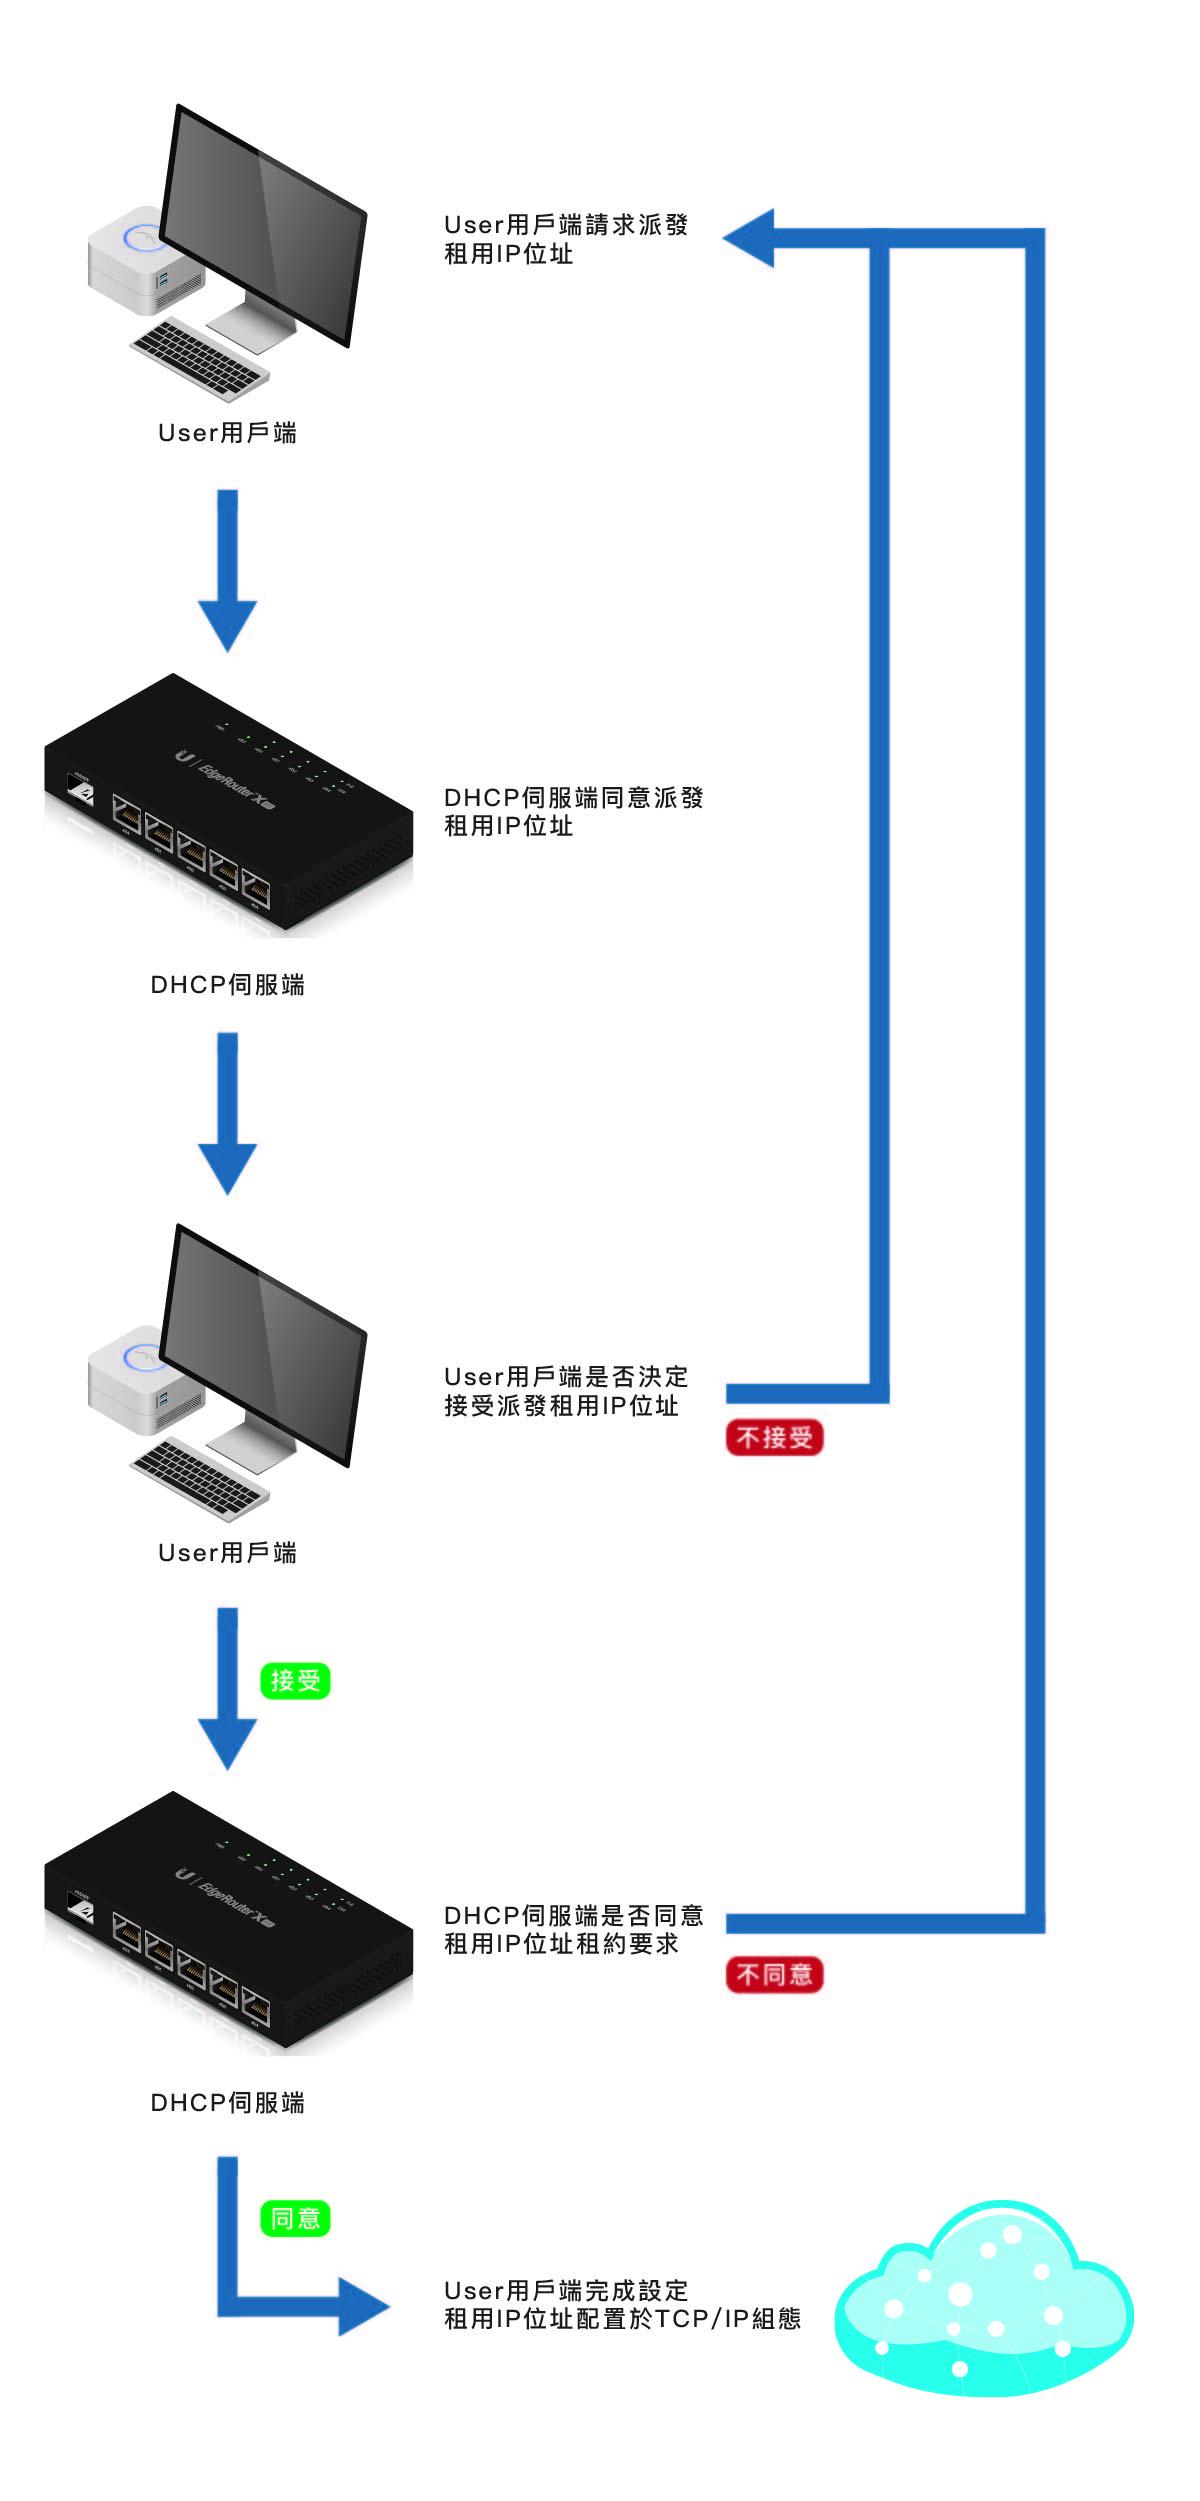 弄懂 DHCP 基本原理 9